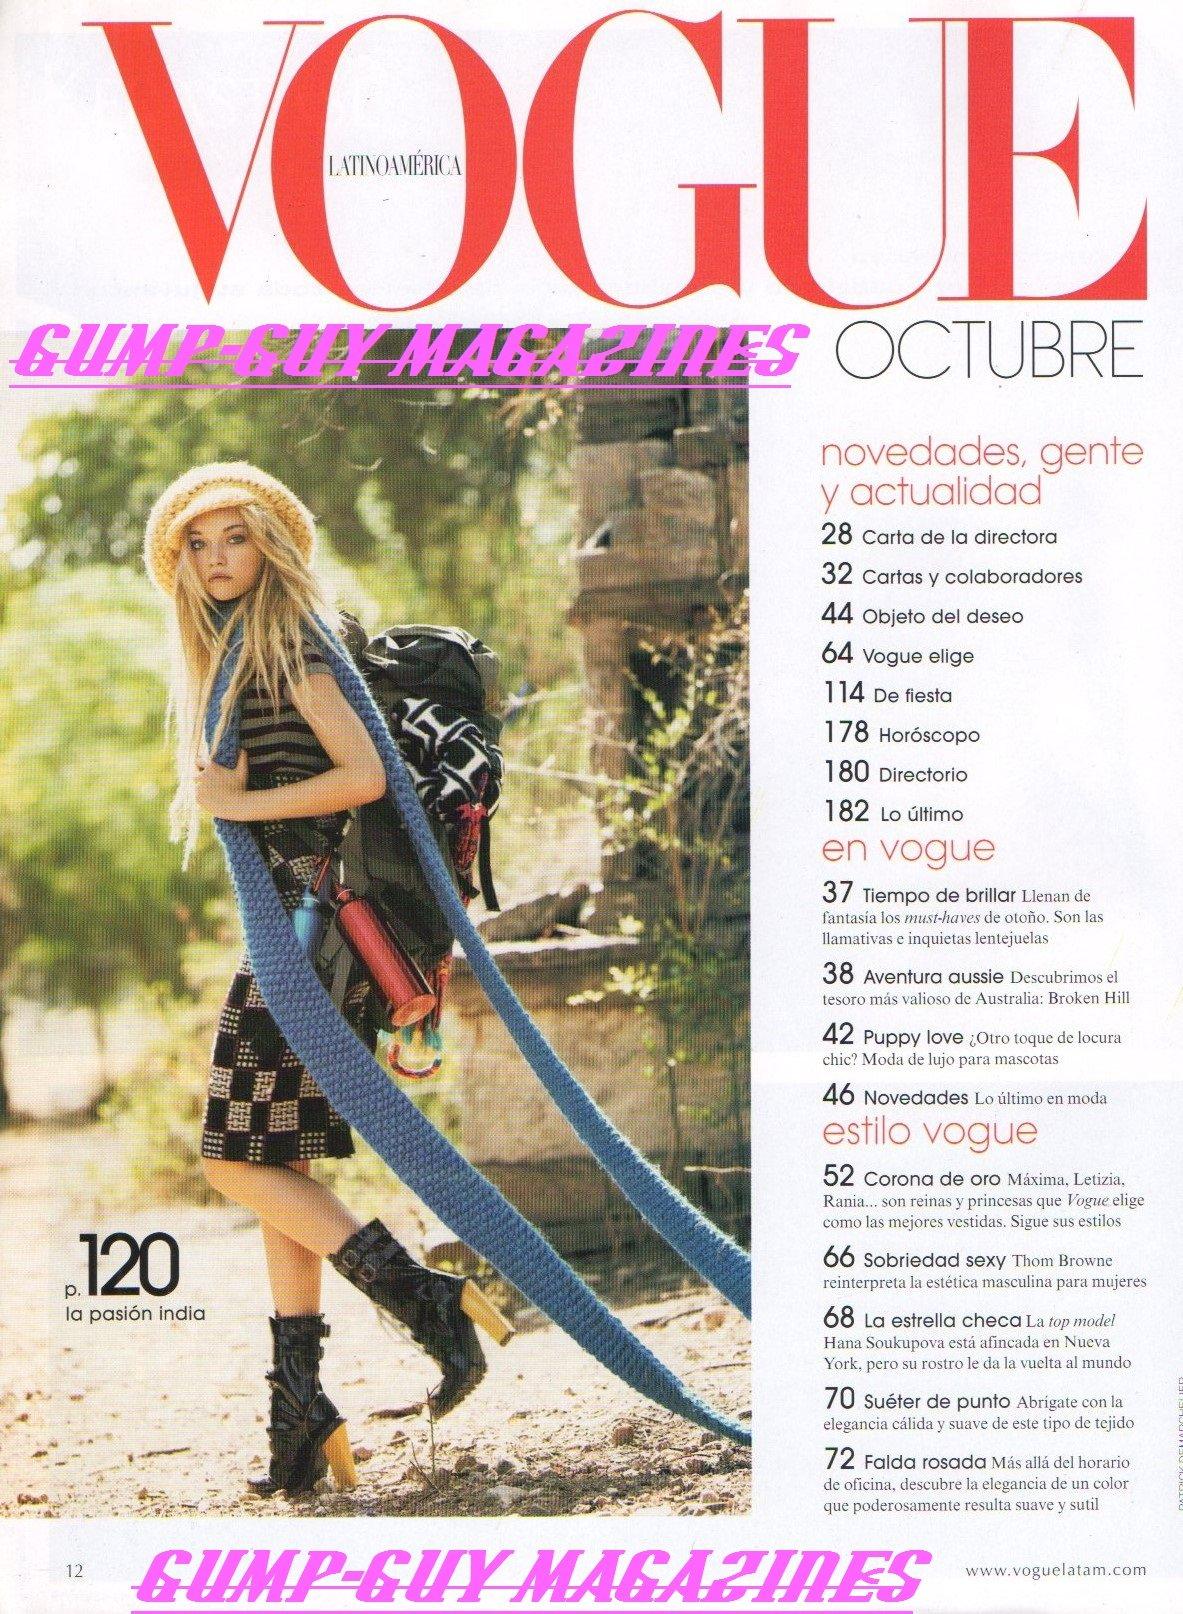 Vogue Latino America Magazine Octubre 2007 HANA SOUKUPOVA RELOJES HOY... + EL TRENCH SE MODERNIZA EXCLUSIVA DESDE PARIS LA MUSA DE KARL LAGERFELD LAS REINAS ...